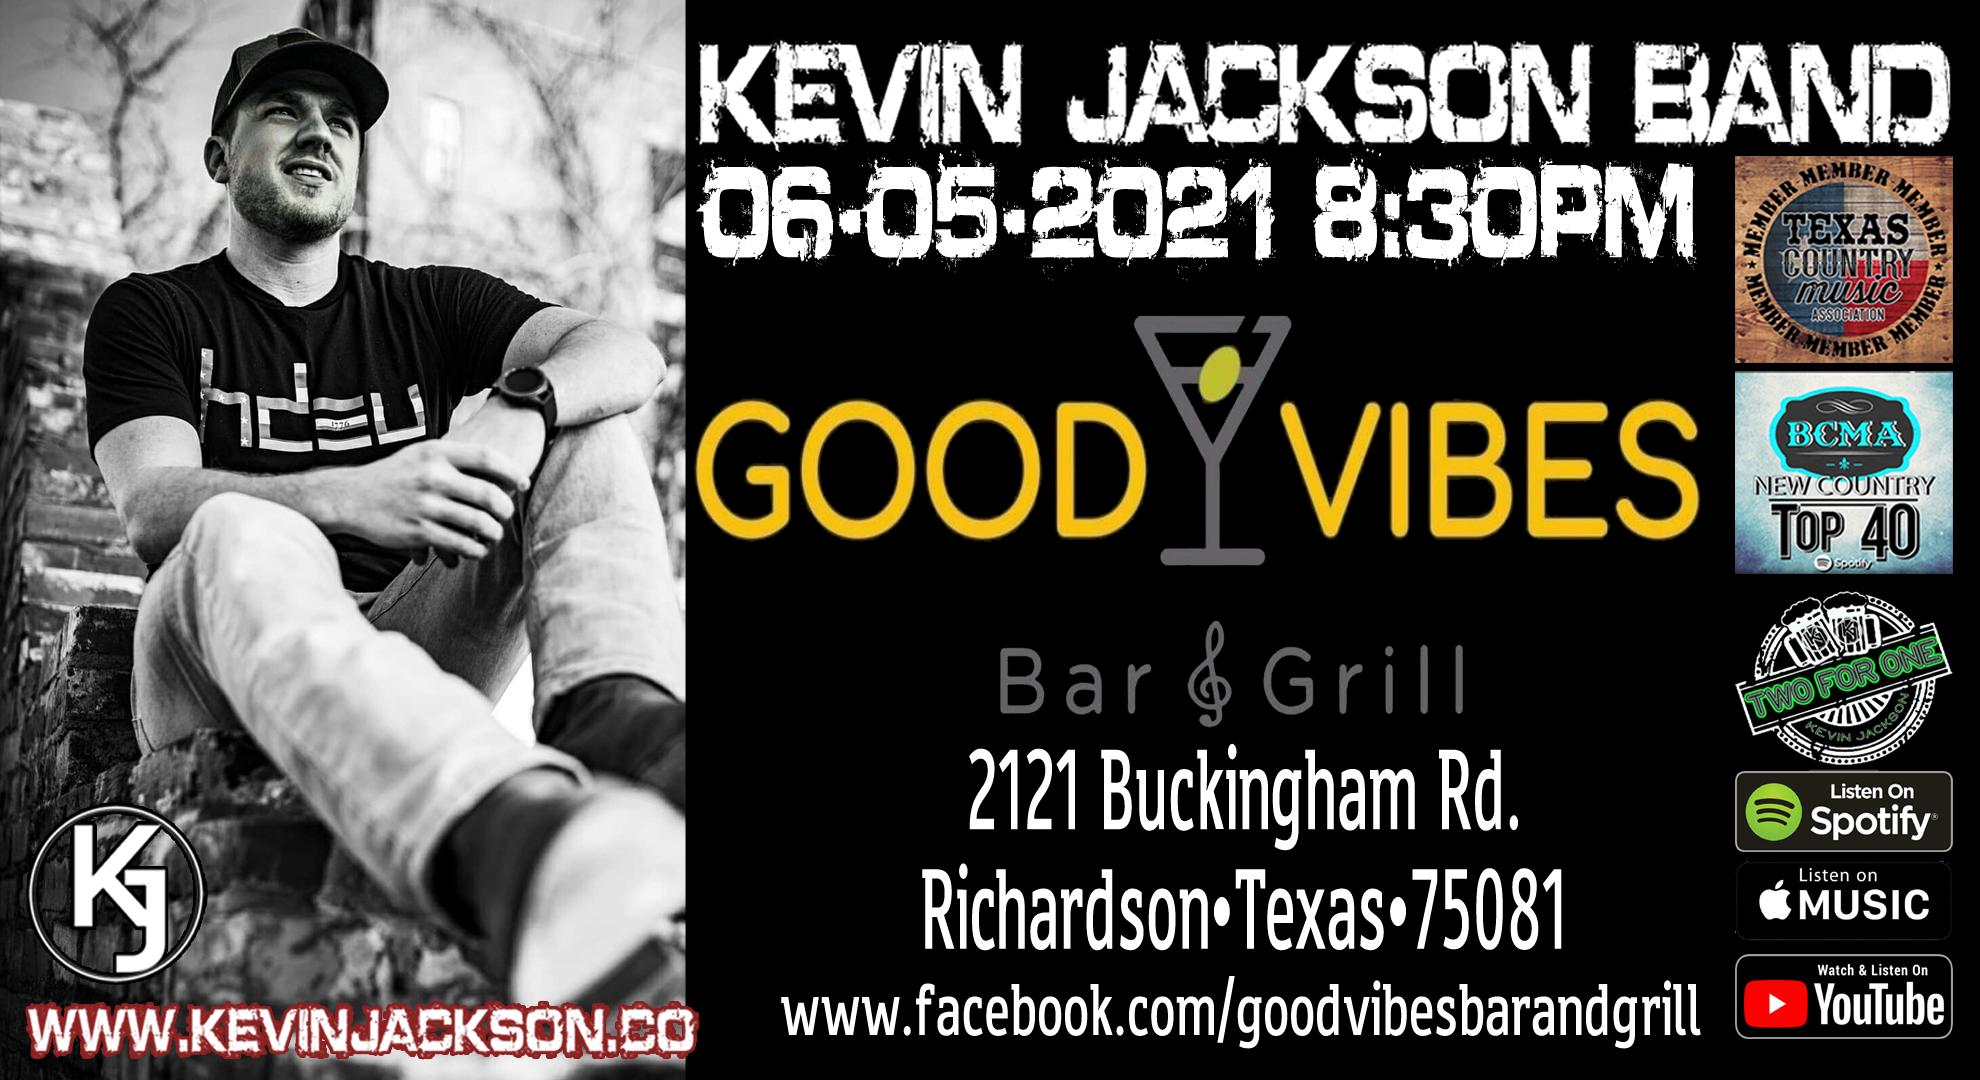 Kevin Jackson_GOOD VIBES_06-05-2021_10 c